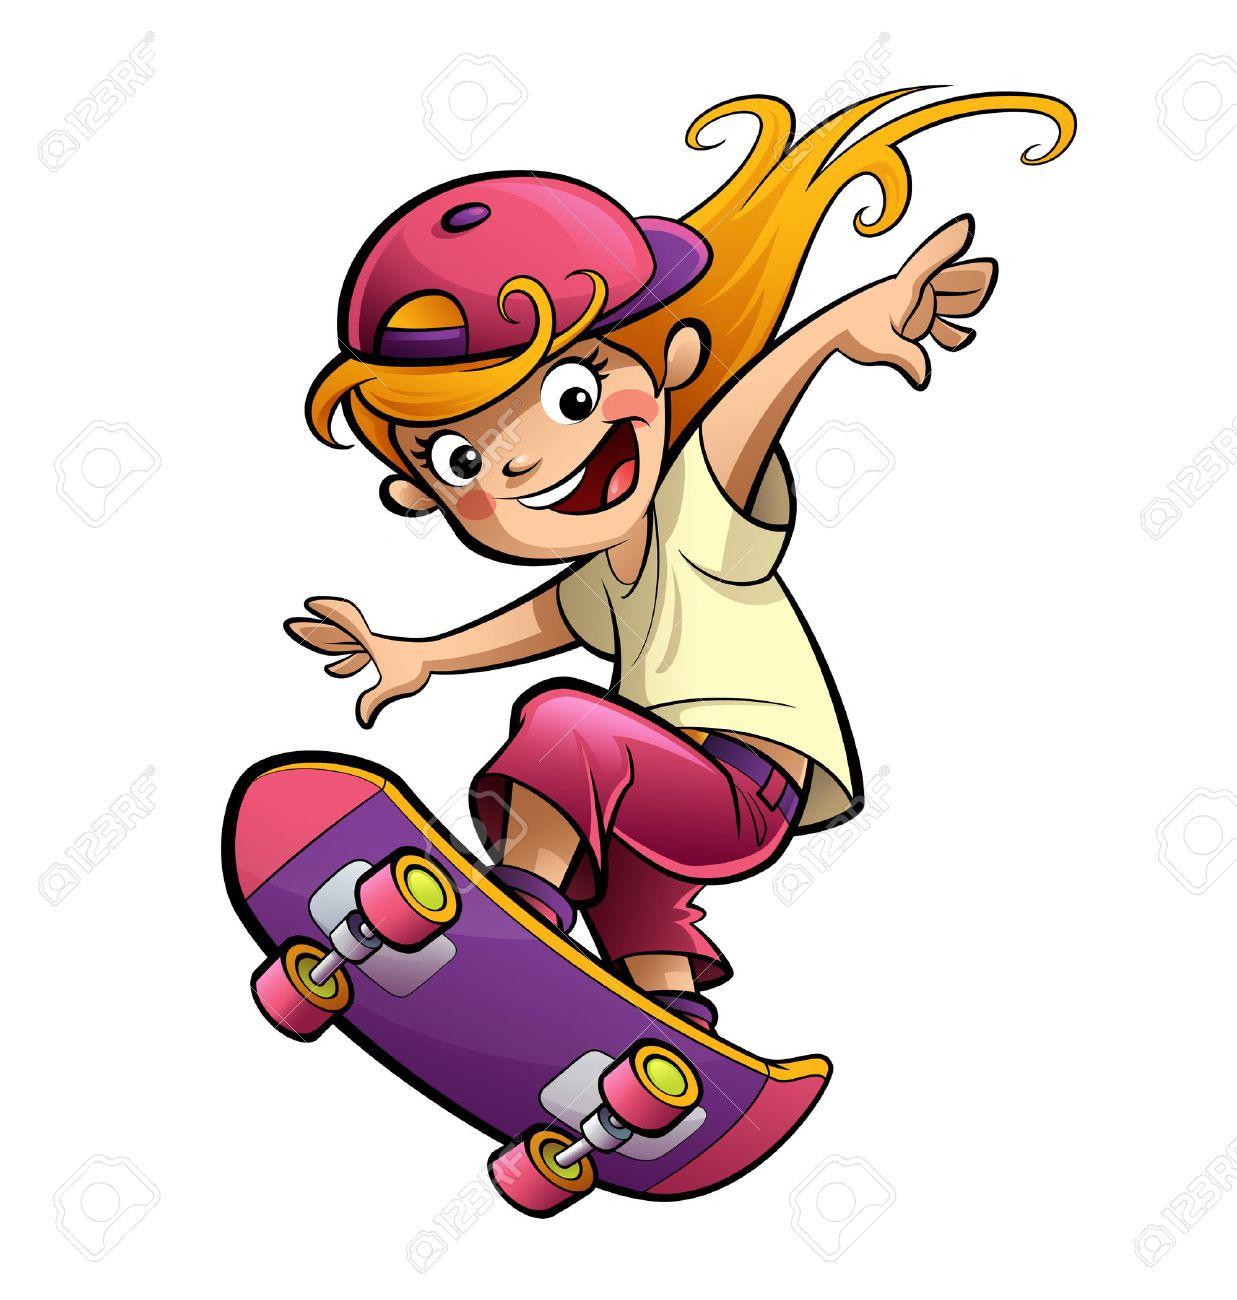 551 Skateboard free clipart.